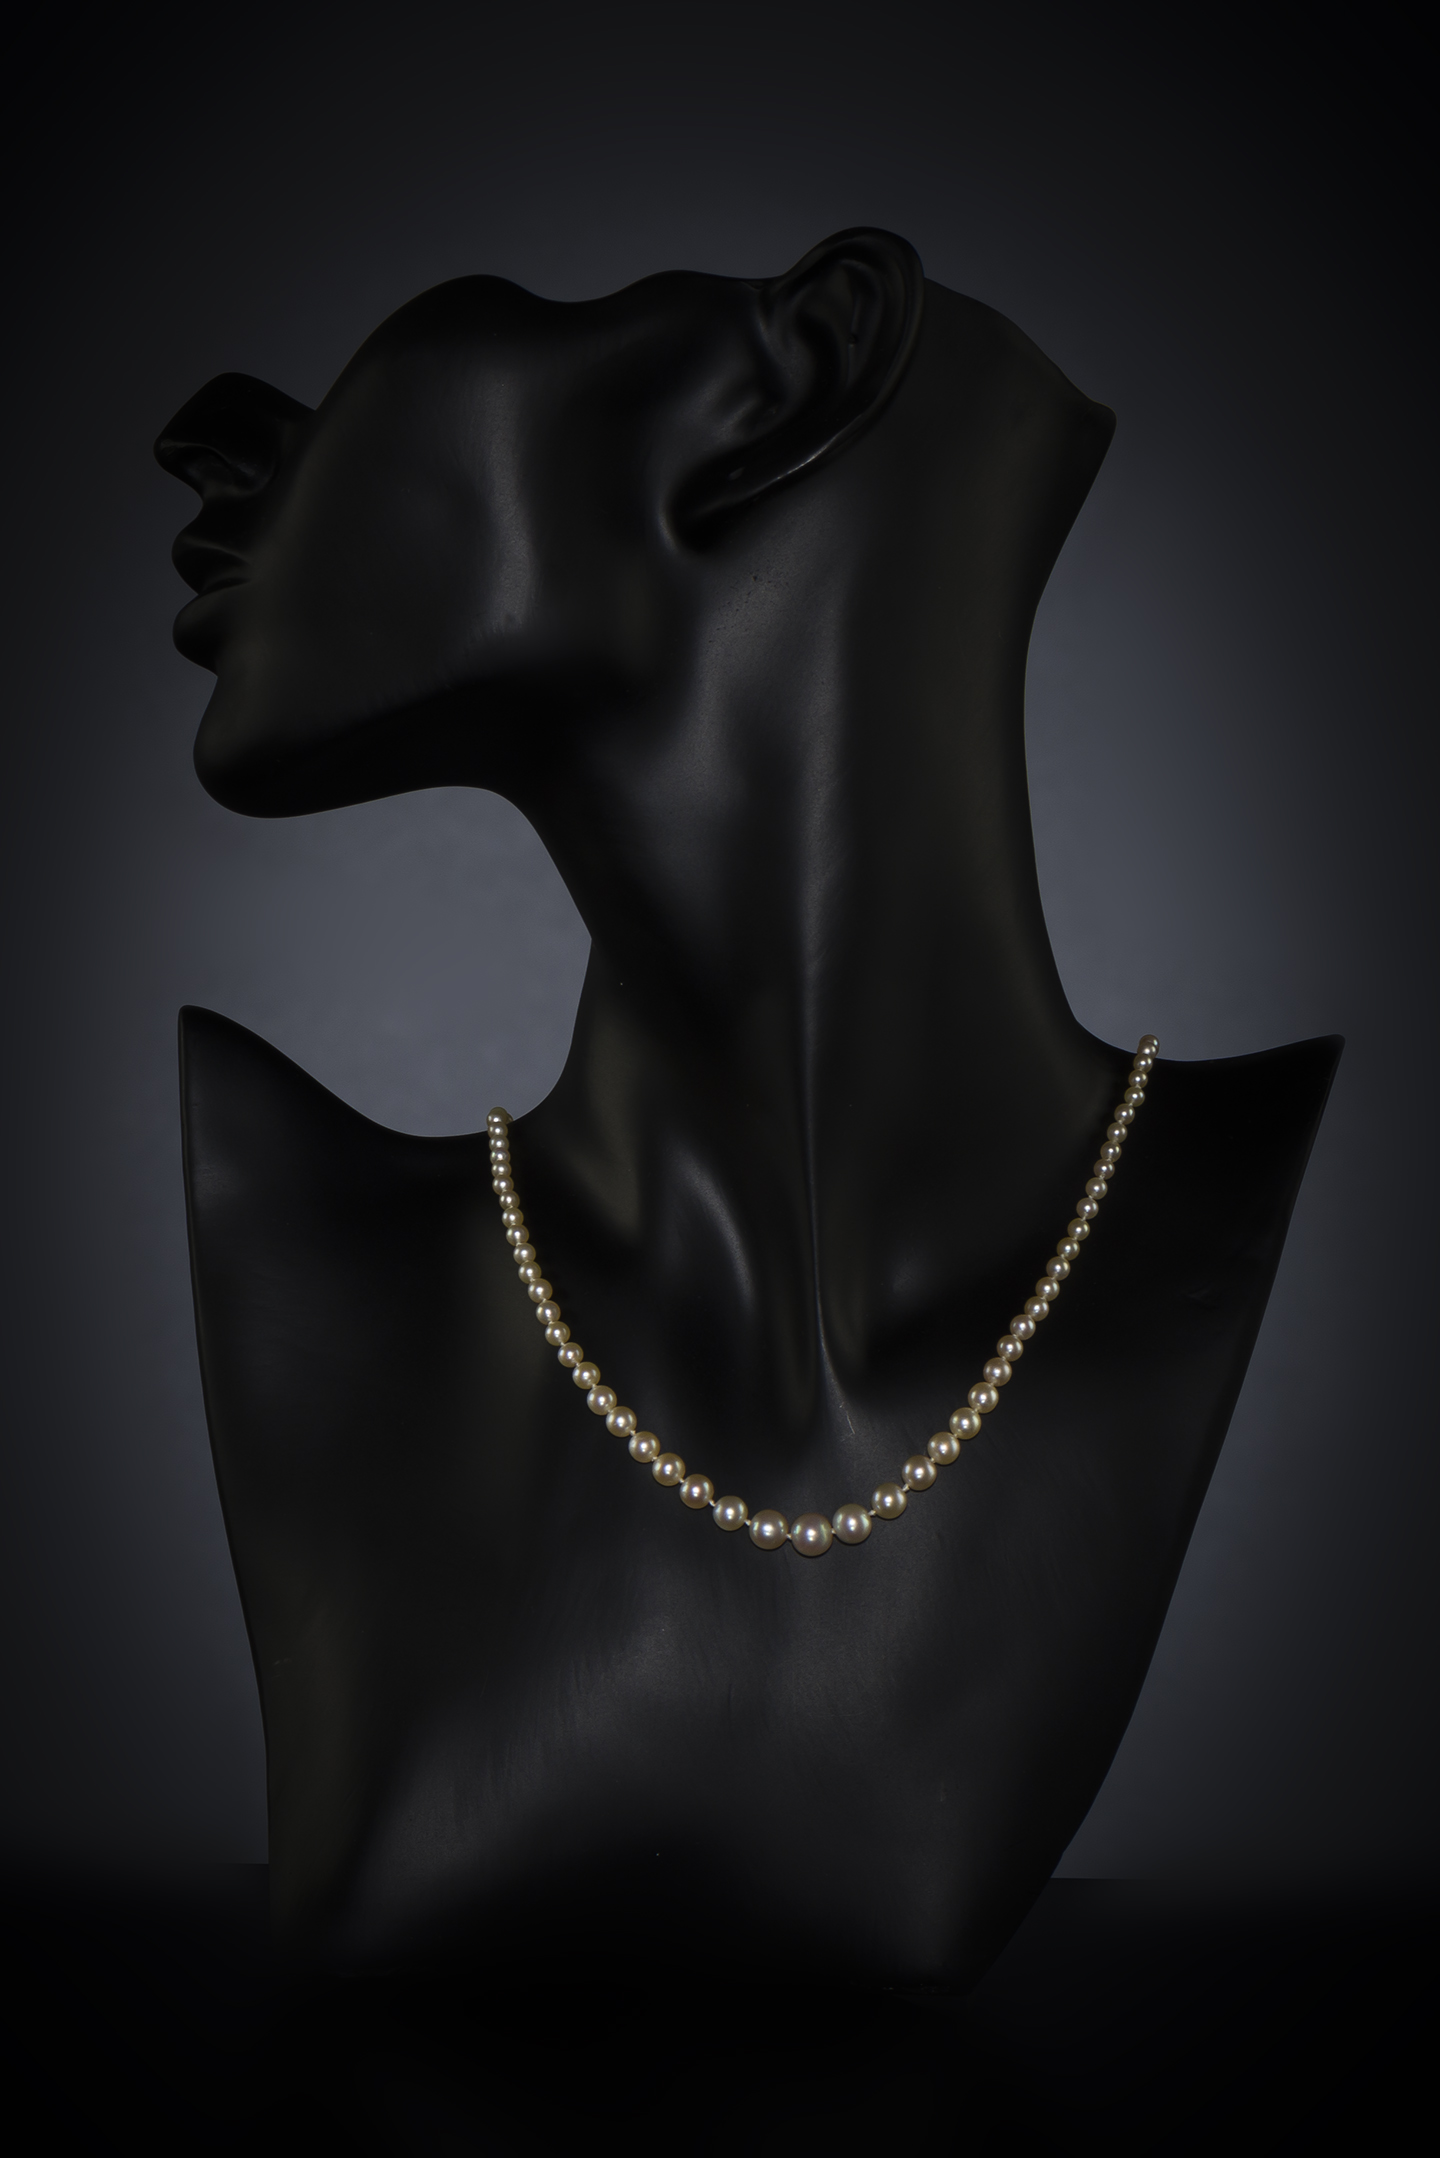 Collier Cartier circa 1929 perles fines (certificat LFG)-2